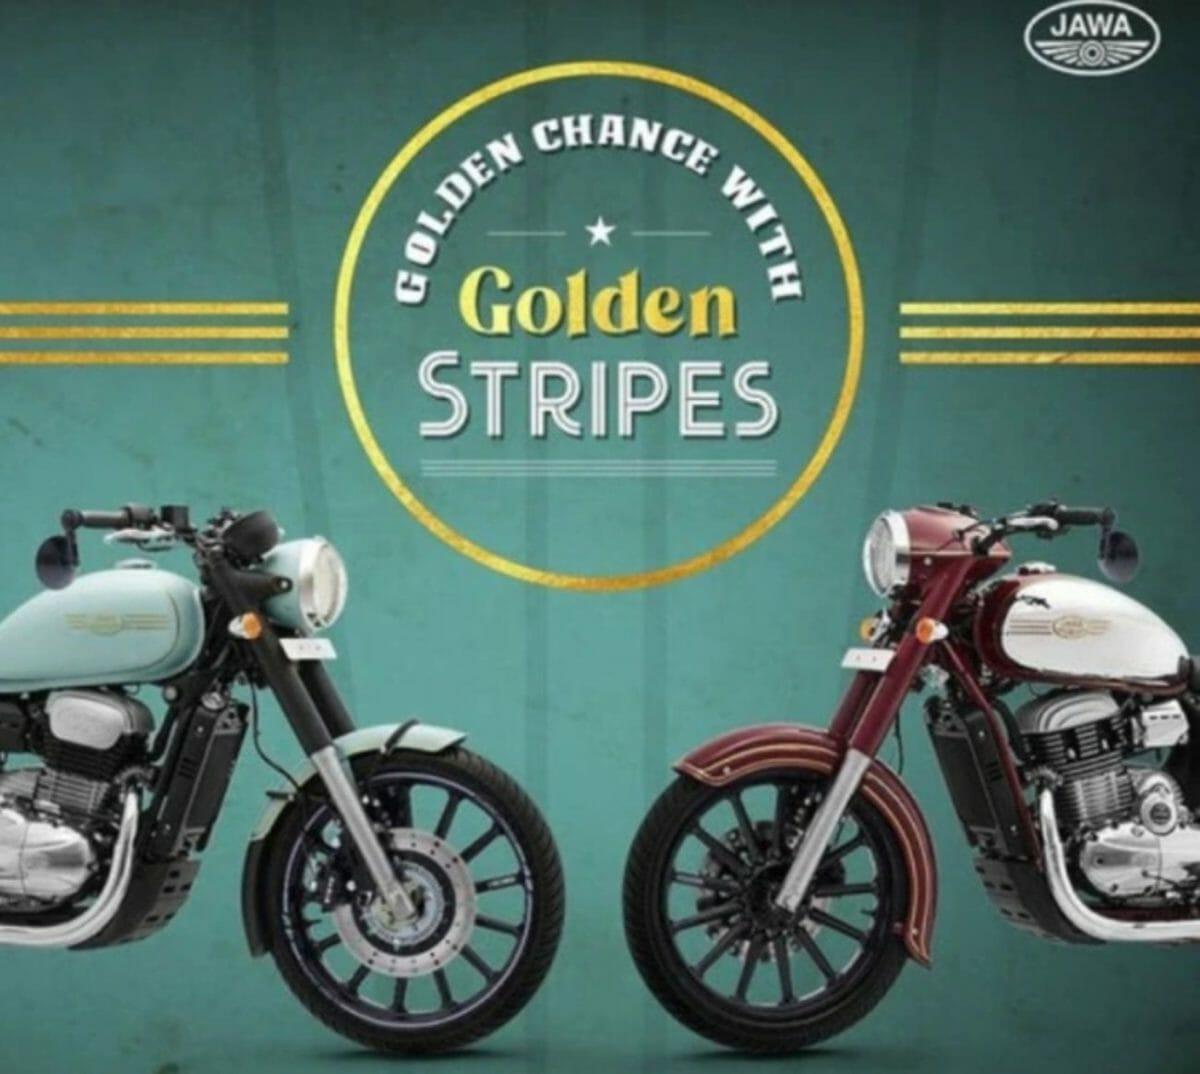 Jawa Golden stripes offer